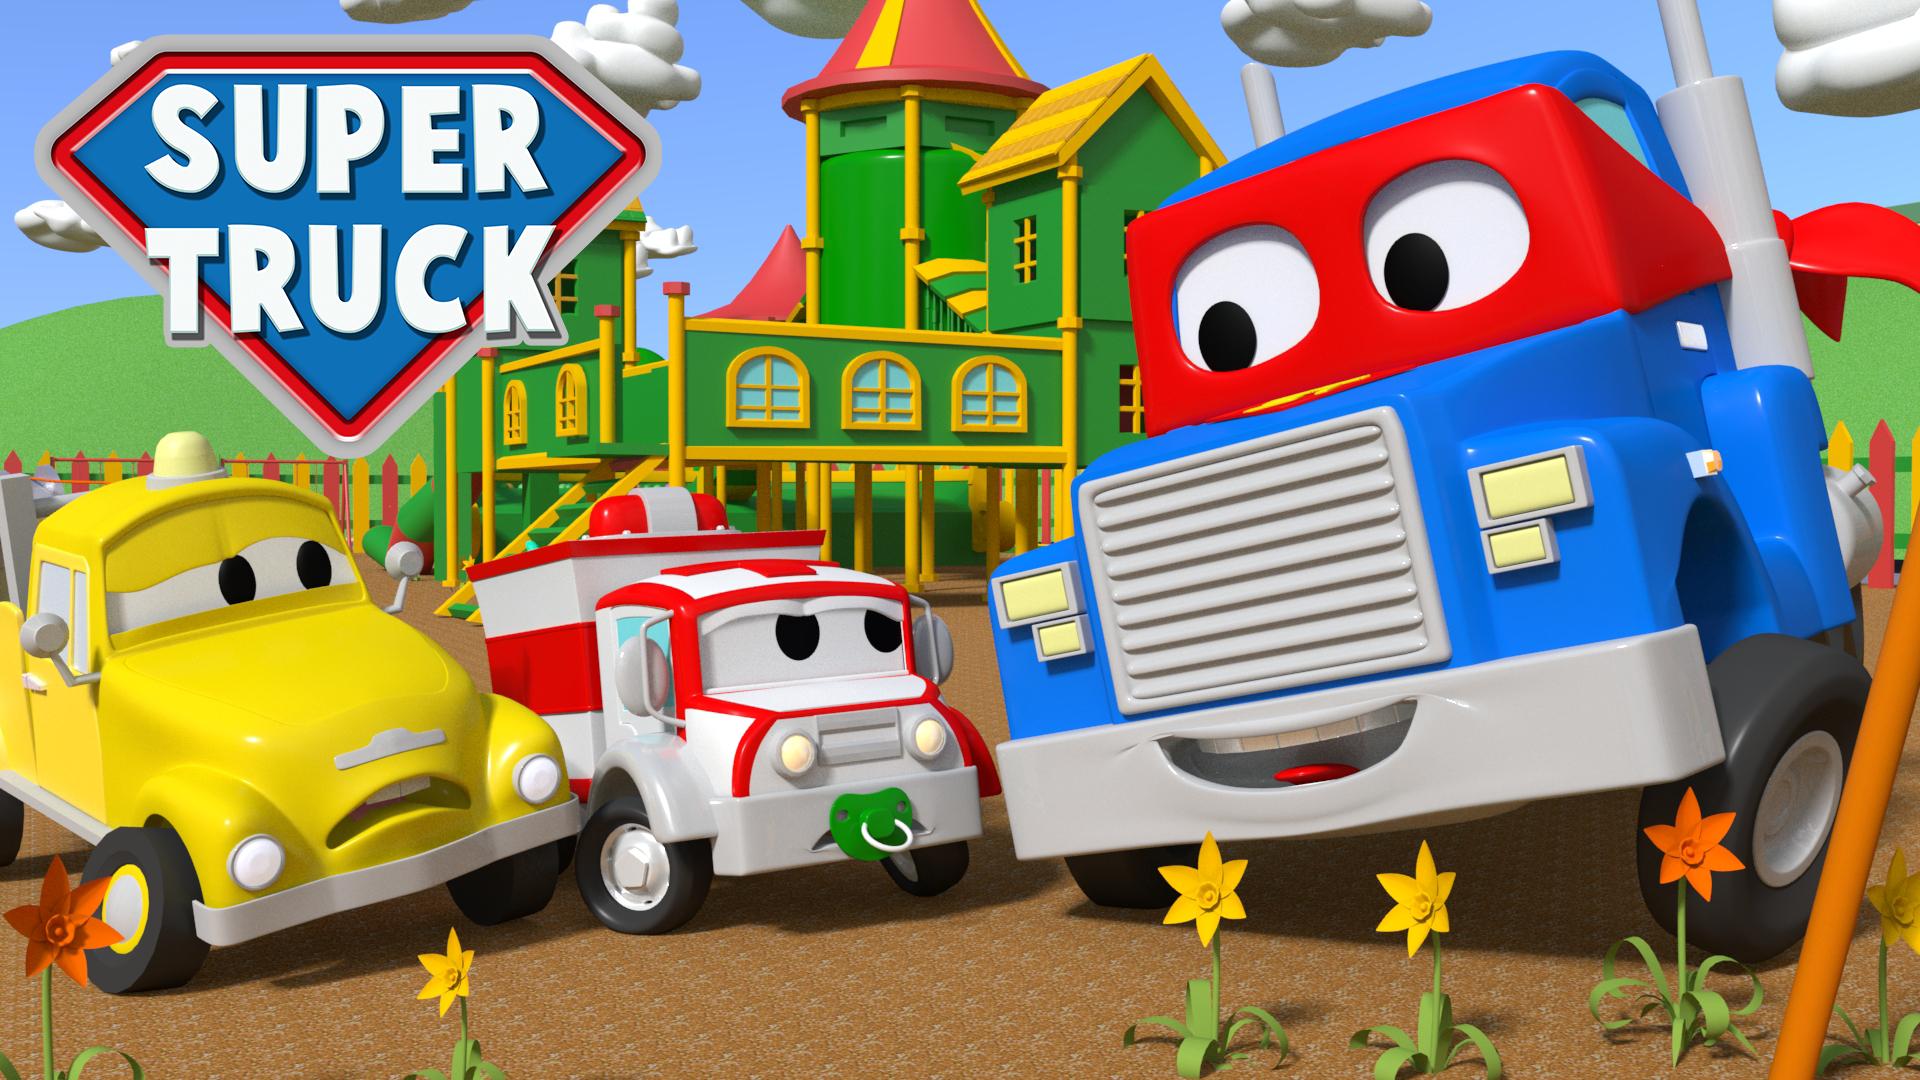 Super Truck of Car City on Amazon Prime Video UK